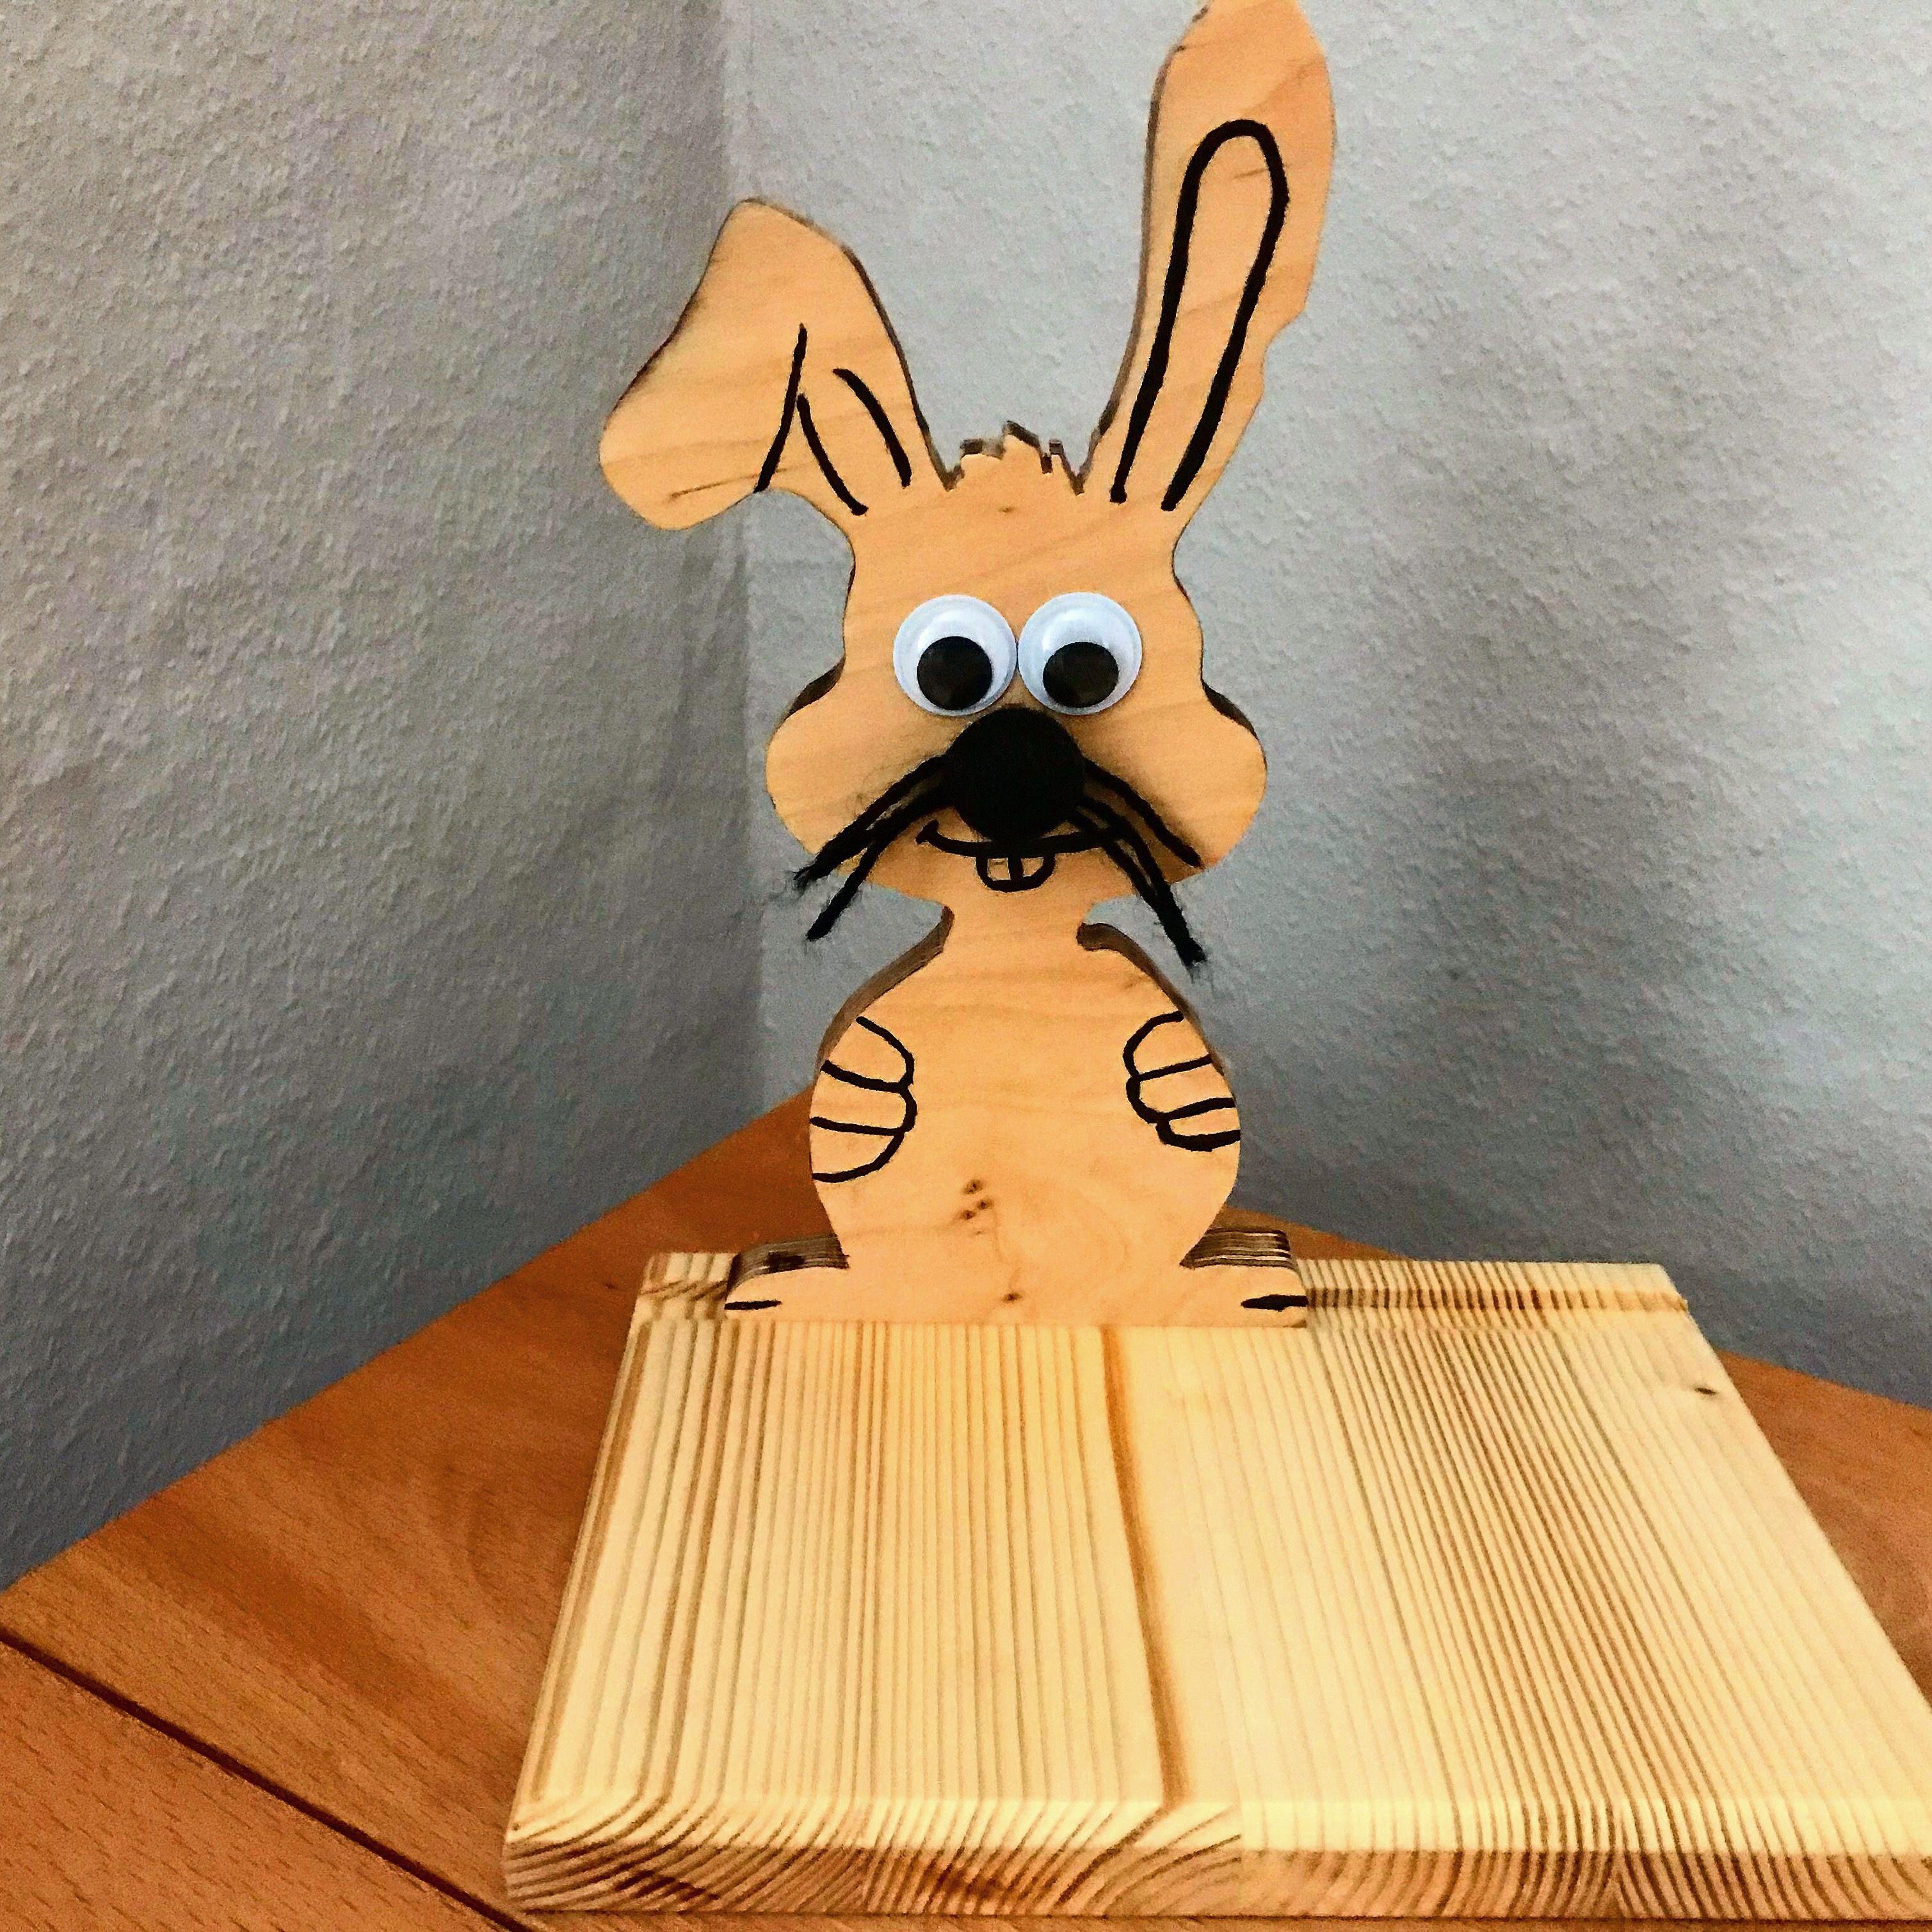 Dekorativen Osterhasen Aus Holz Selber Basteln   Tinker A Decorative Easter  Bunny